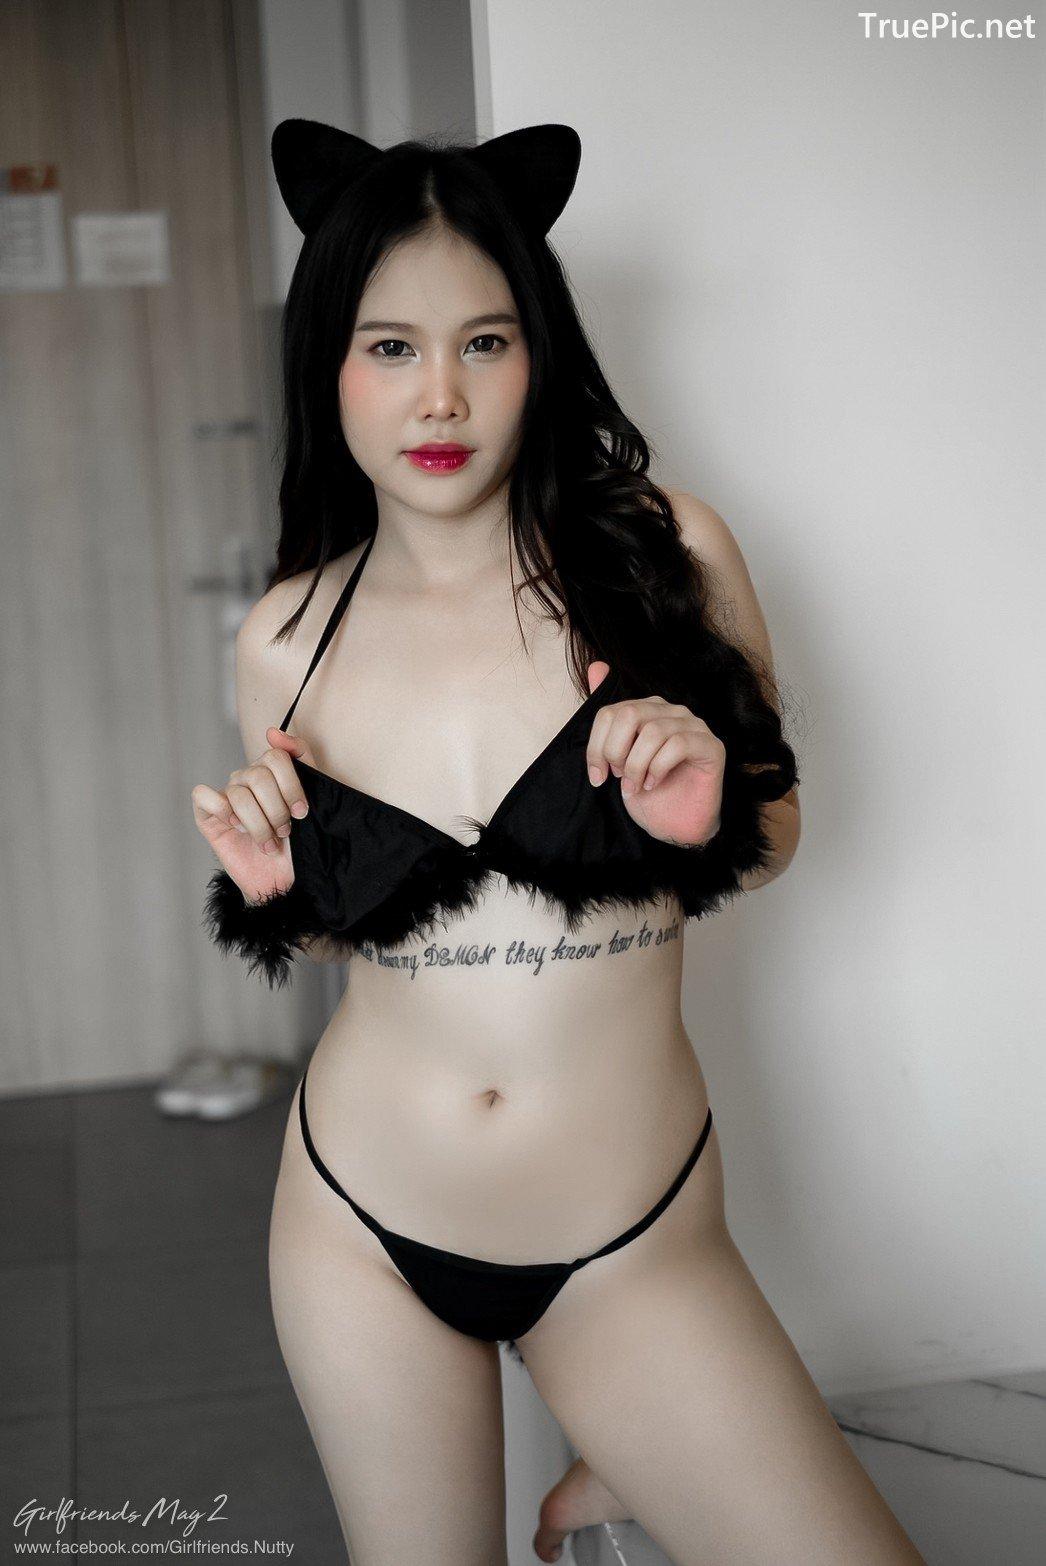 Image Thailand Model - Chanunshida Phuangsombut - Sexy Black Cat - TruePic.net - Picture-3